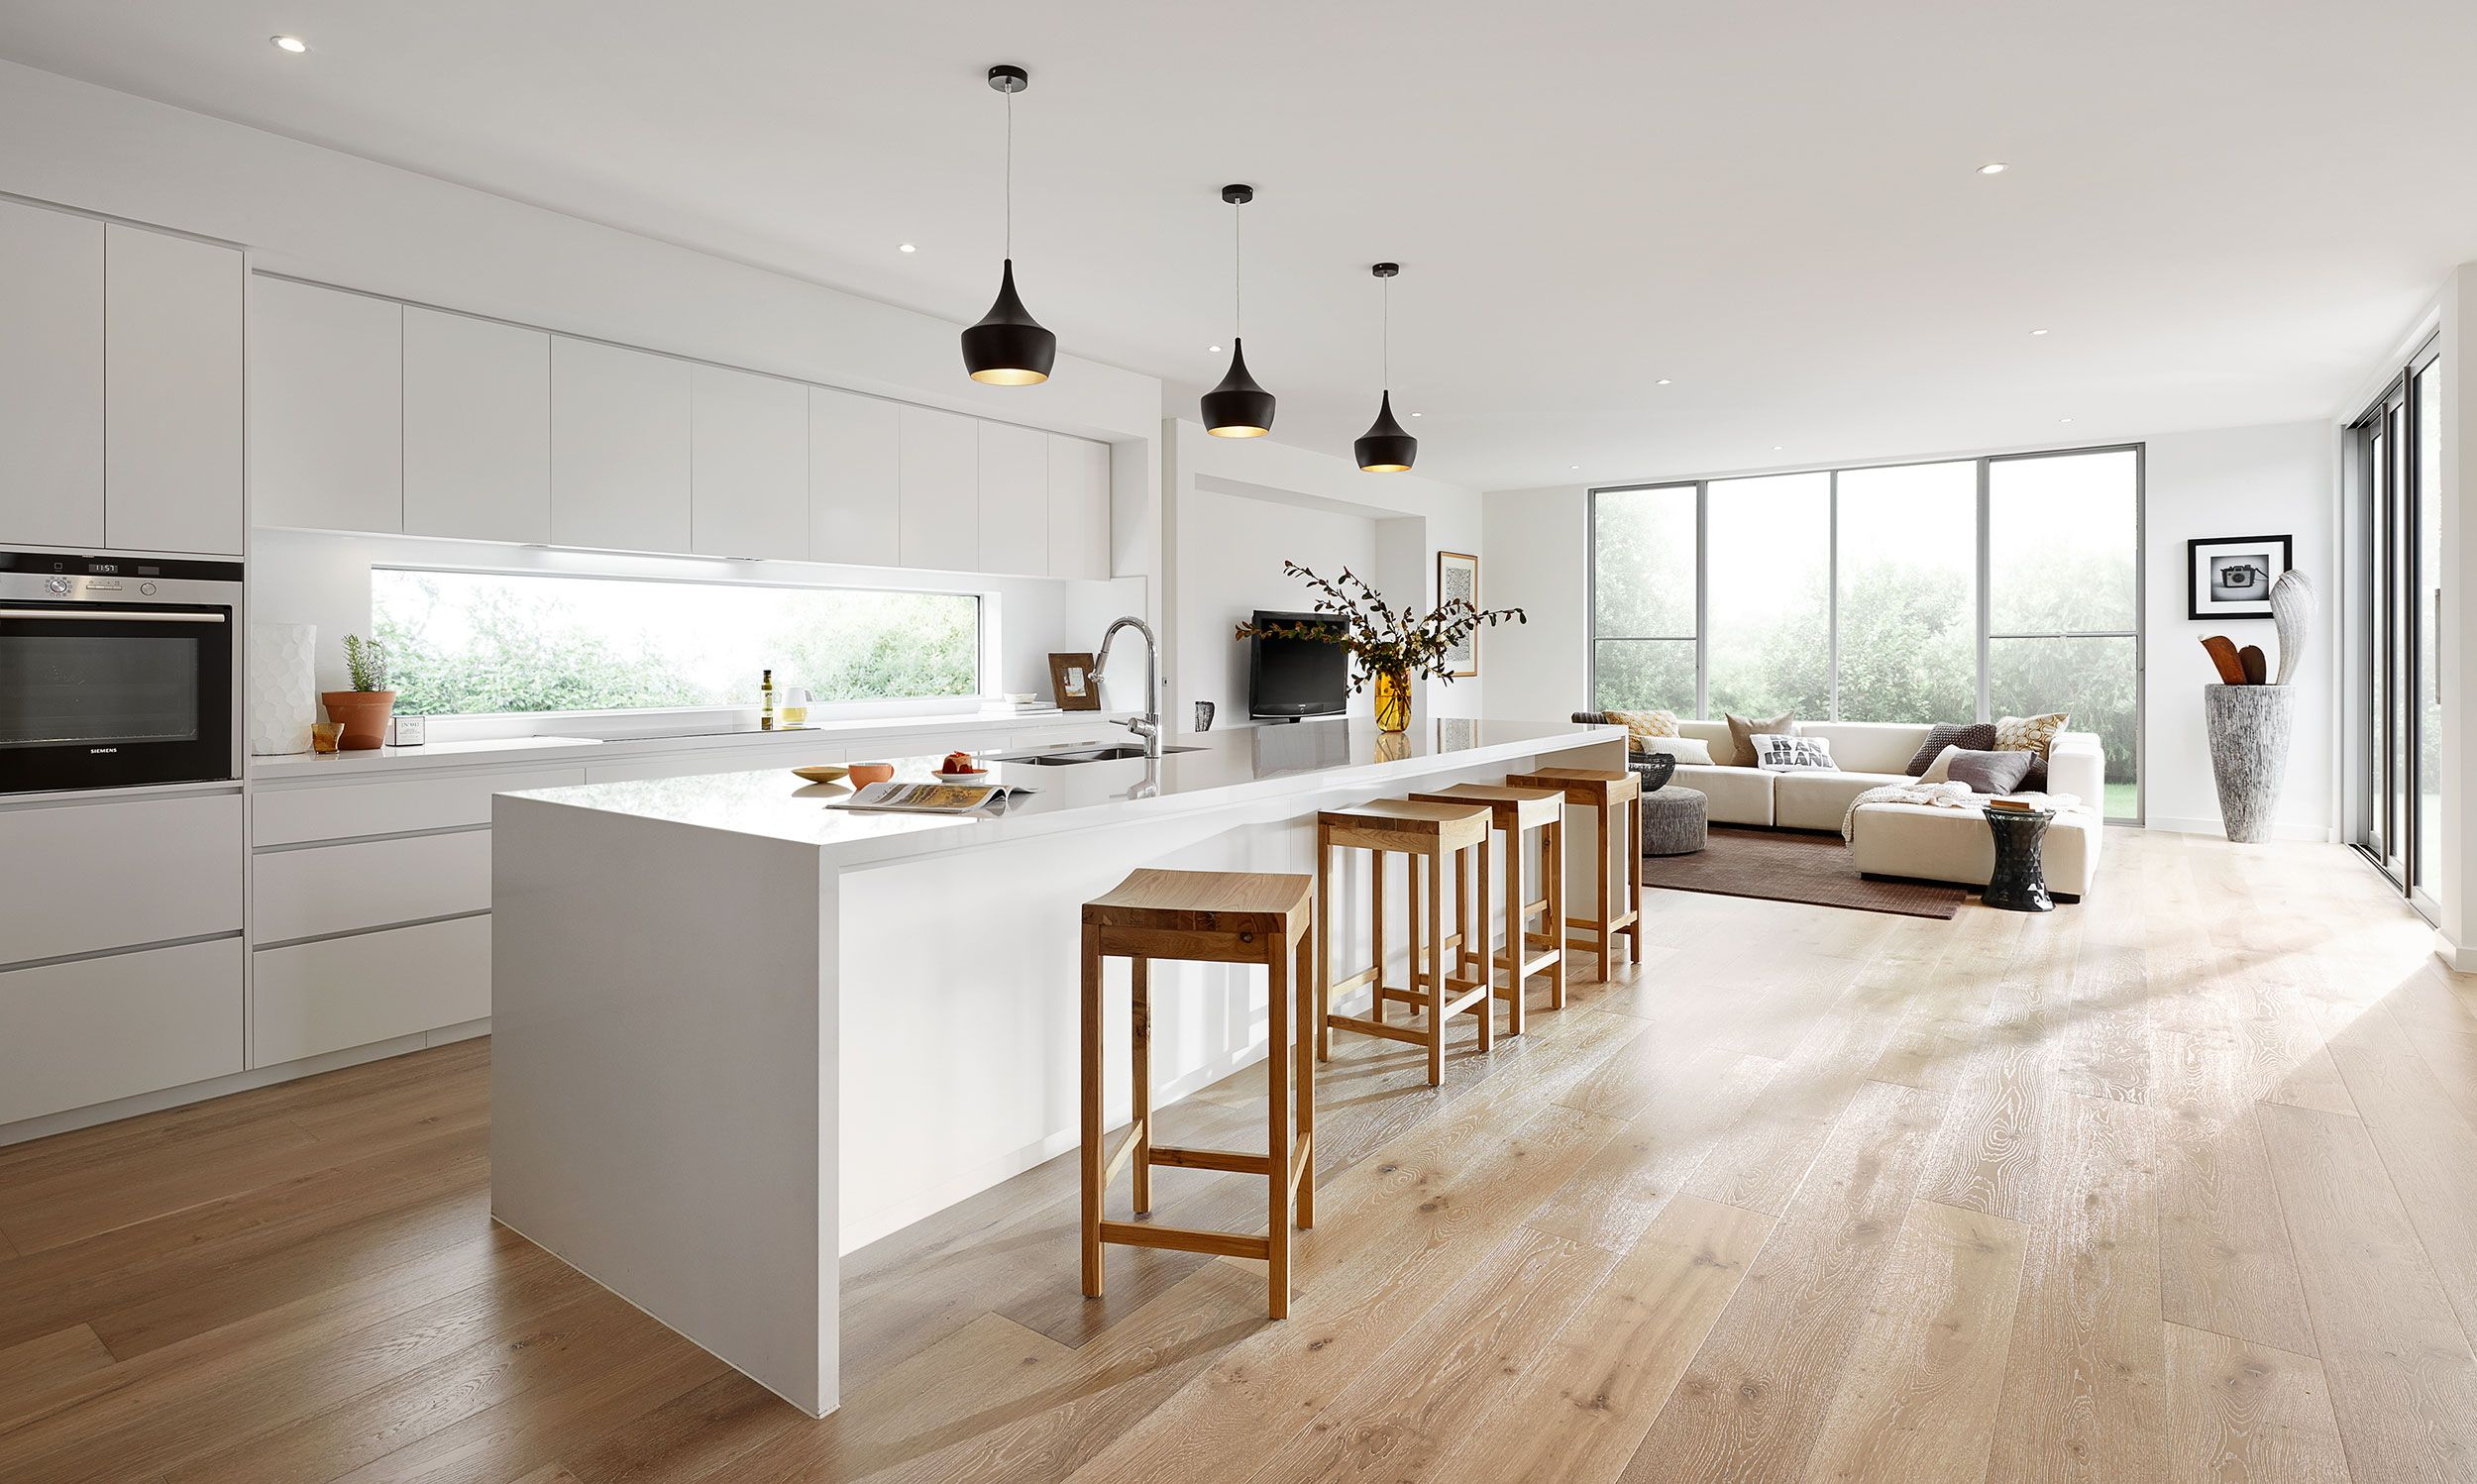 Best Caulfield 50 Kitchen And Family Kitchen Inspiration 400 x 300